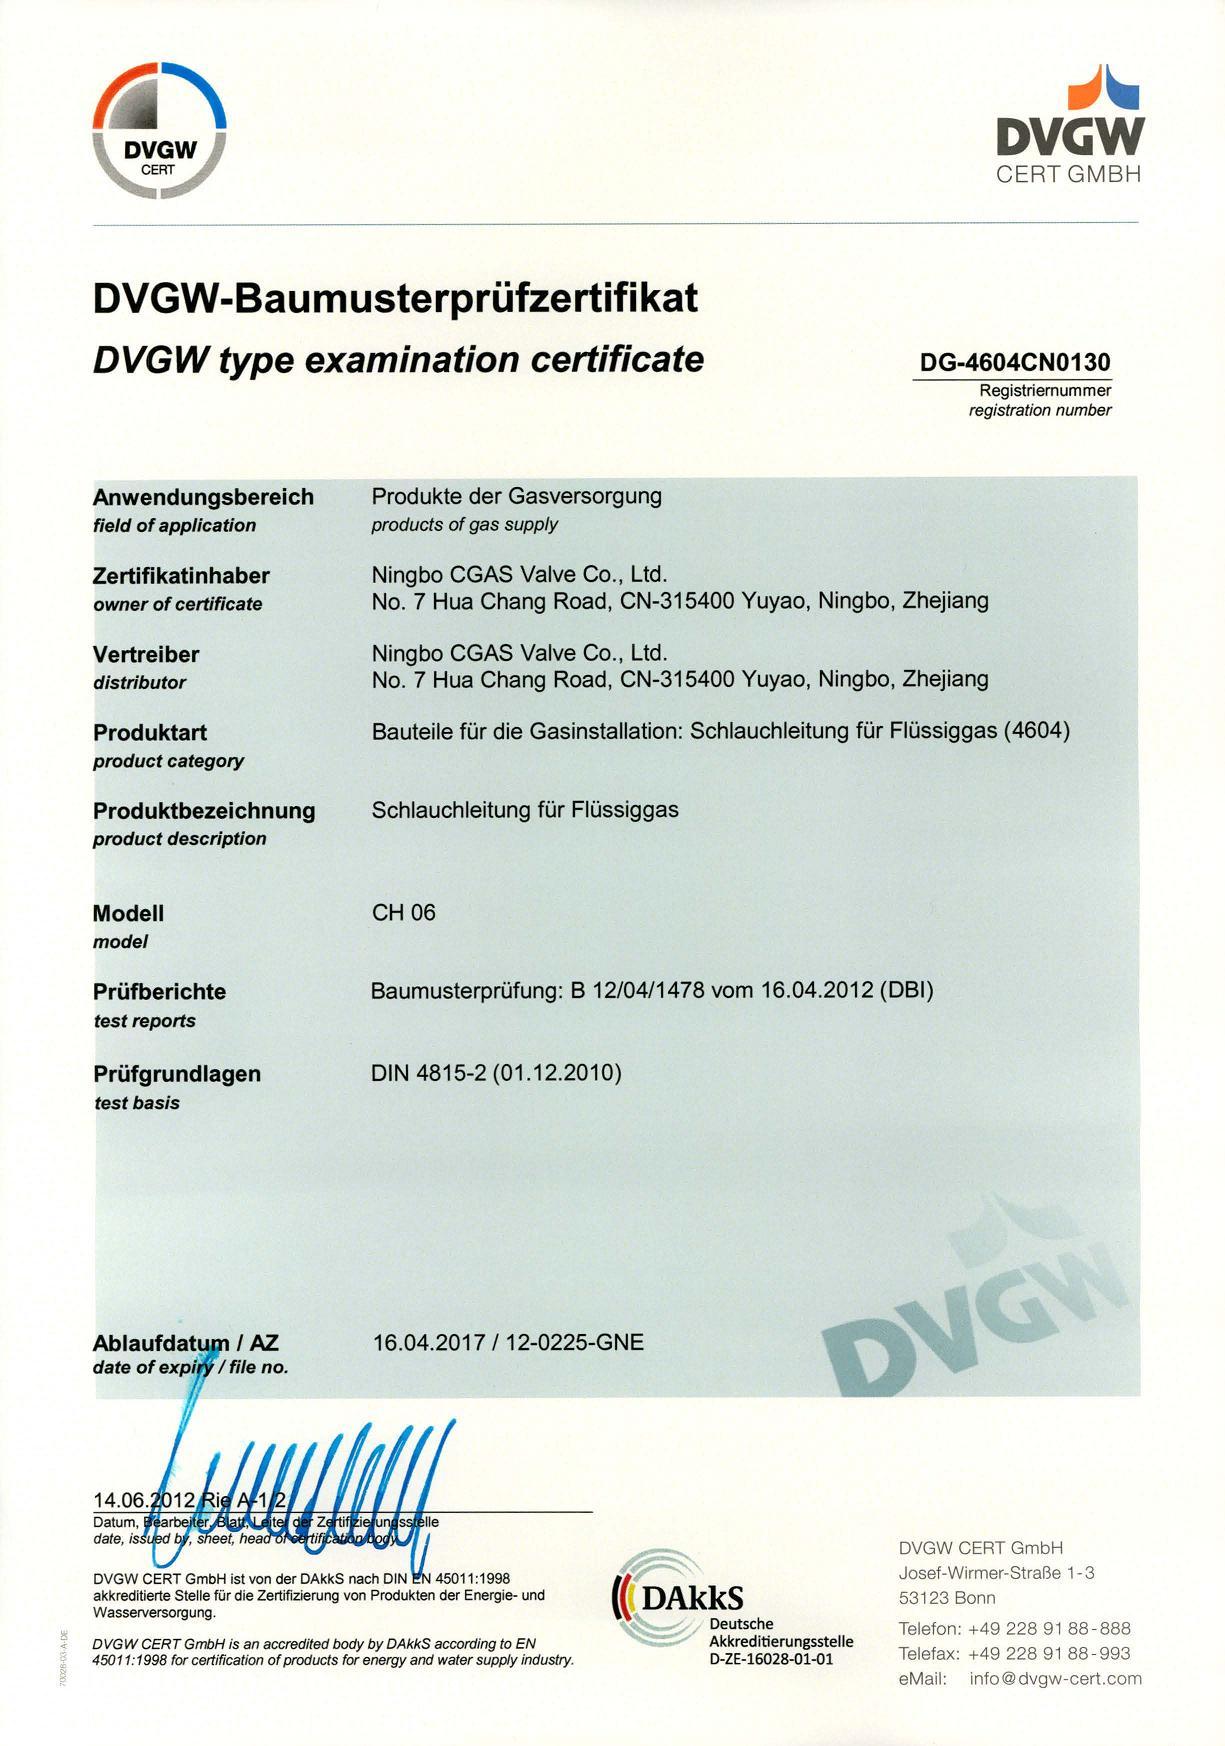 DVGW CERTIFICATE for REGULATOR and HOSE